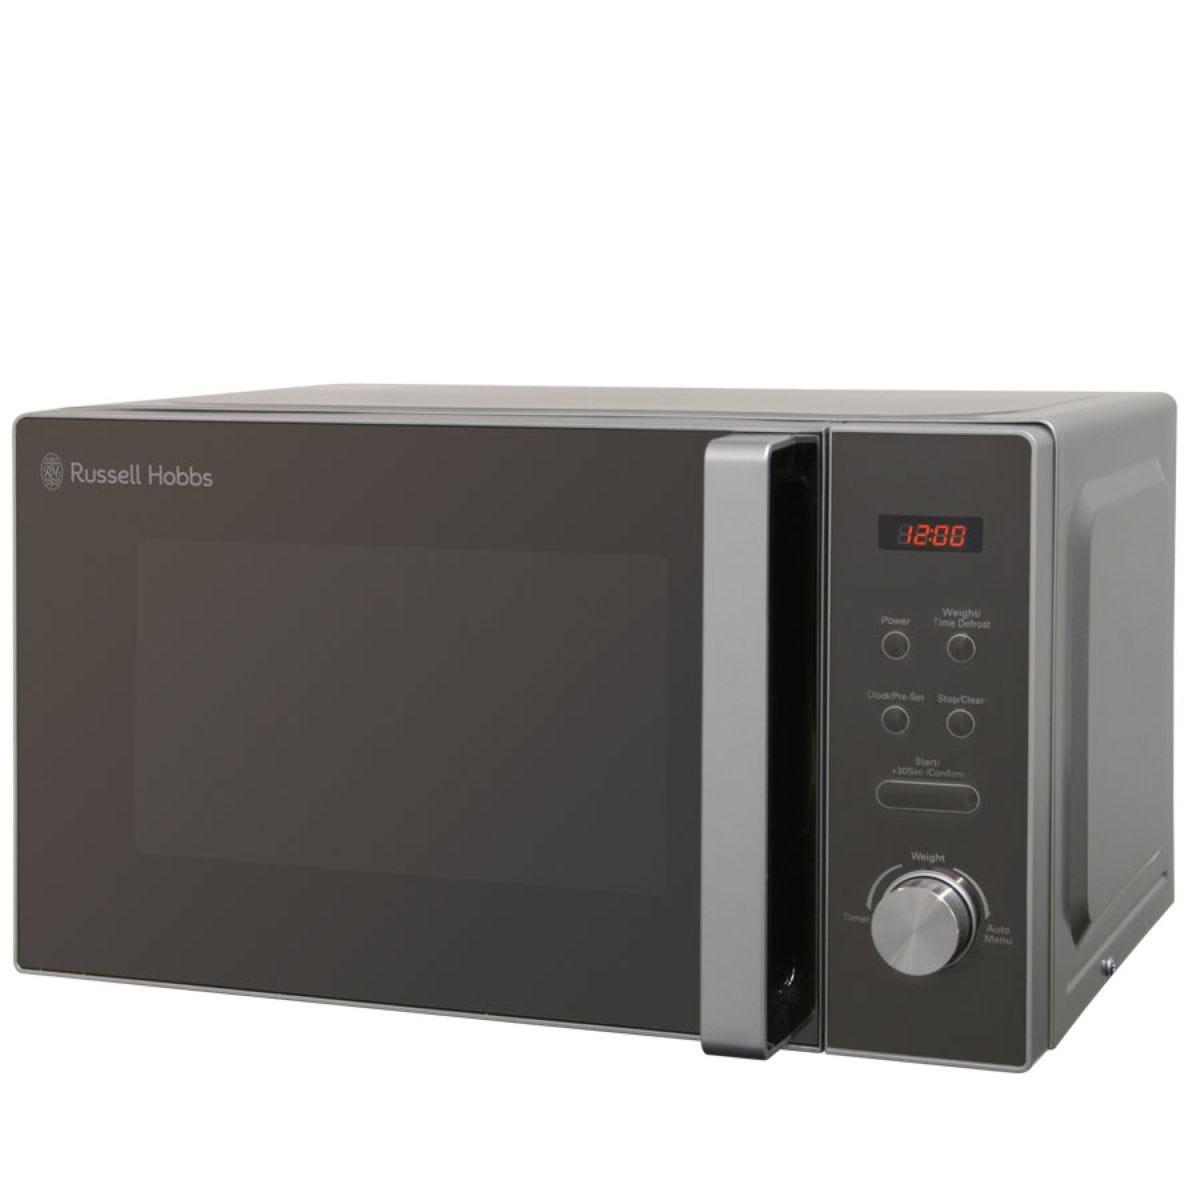 Russell Hobbs RHM2076S 800W 20L Digital Microwave – Silver & Black